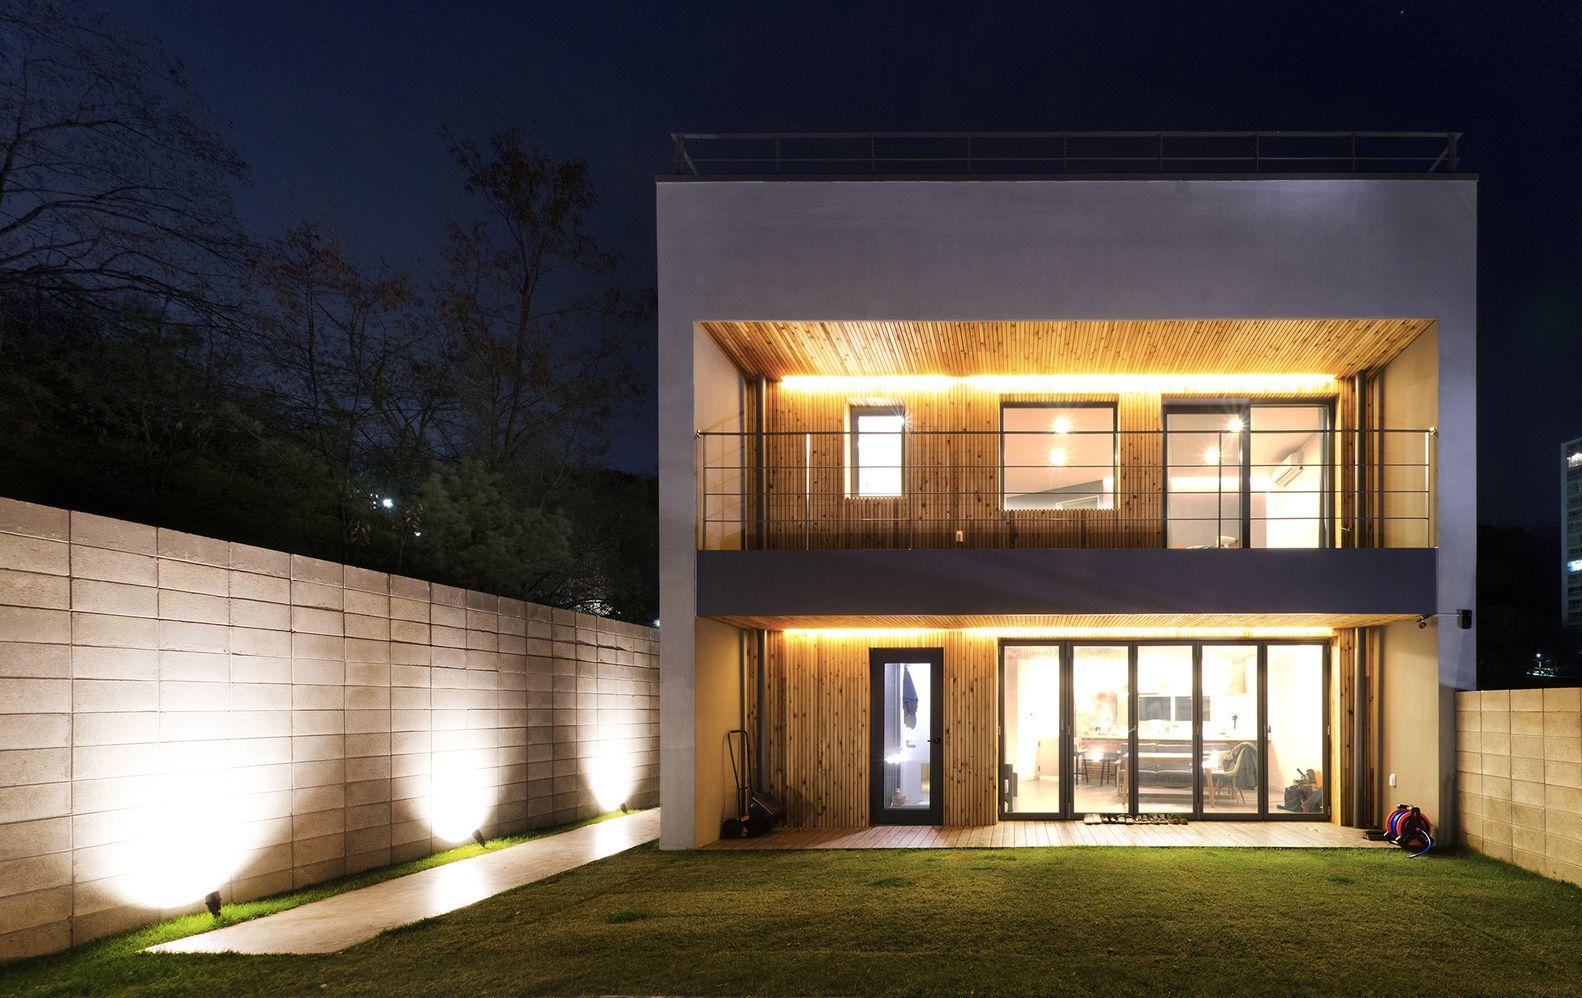 Of Chico Chica House Cho And Partners 11 # Muebles Lola Mora Bahia Blanca